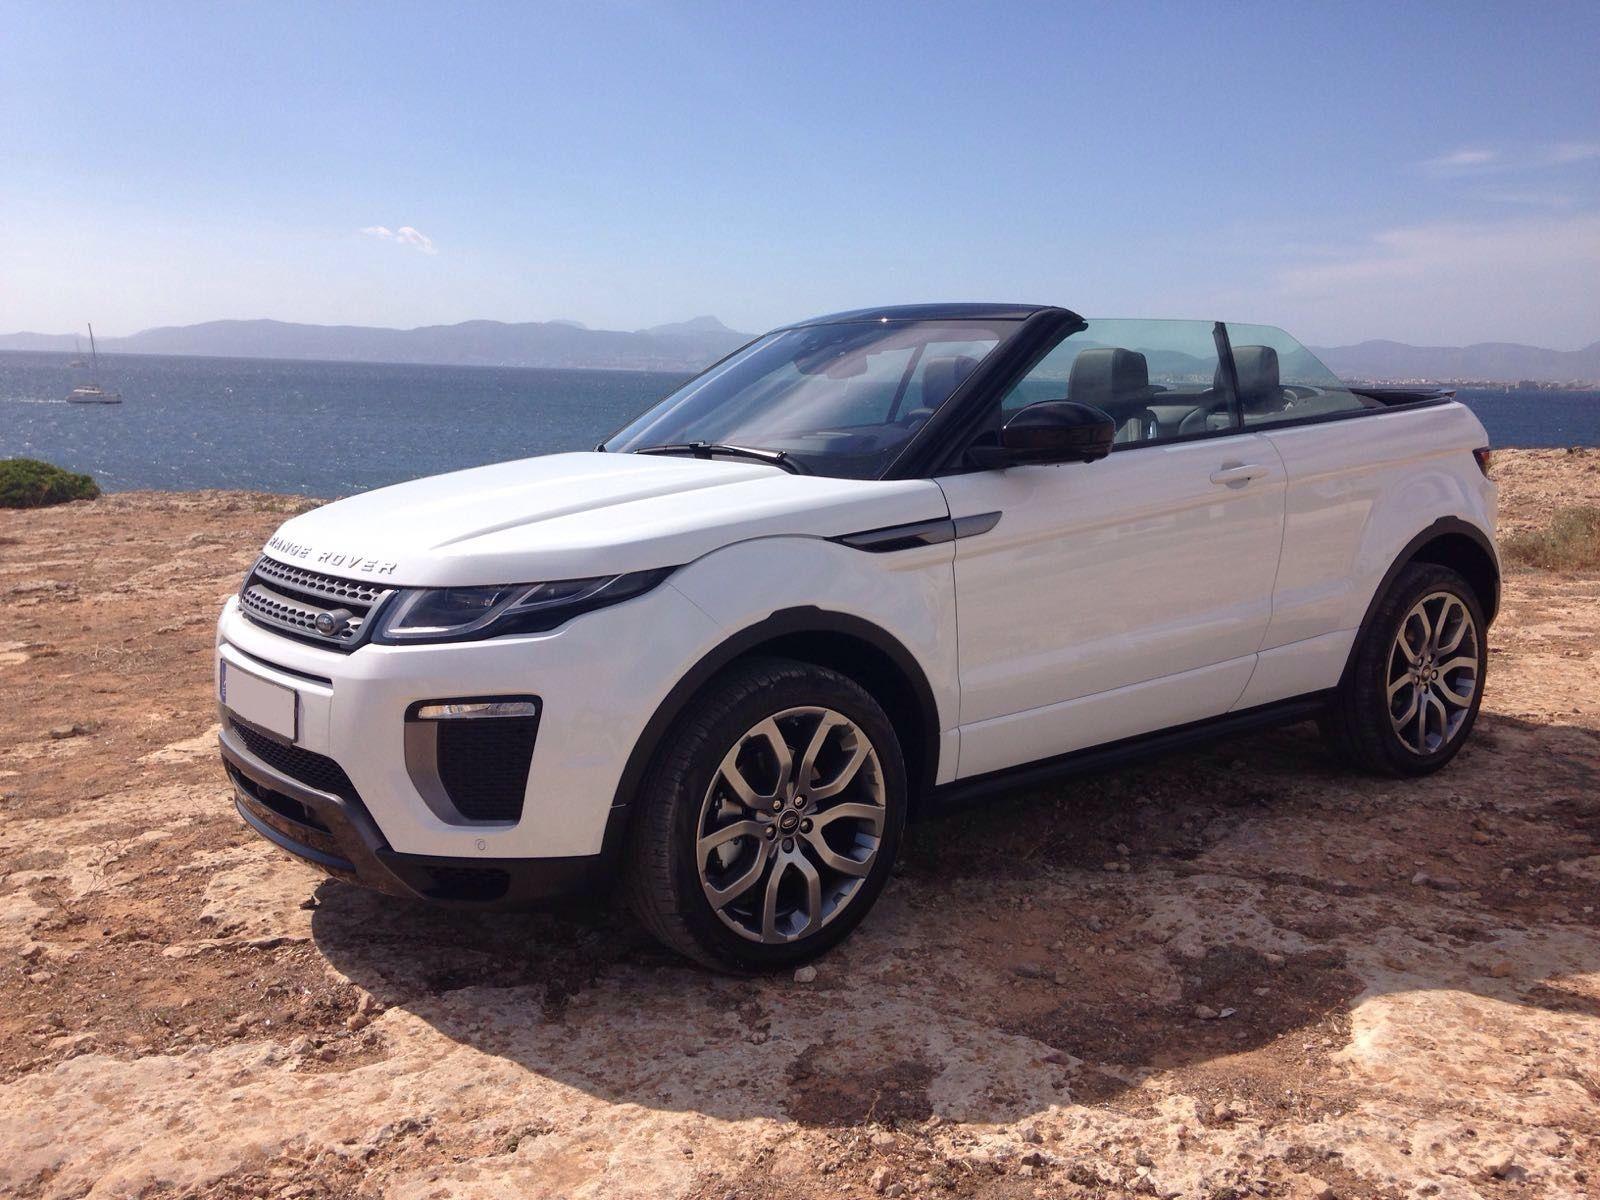 Range-Rover-Evoque-cabrio